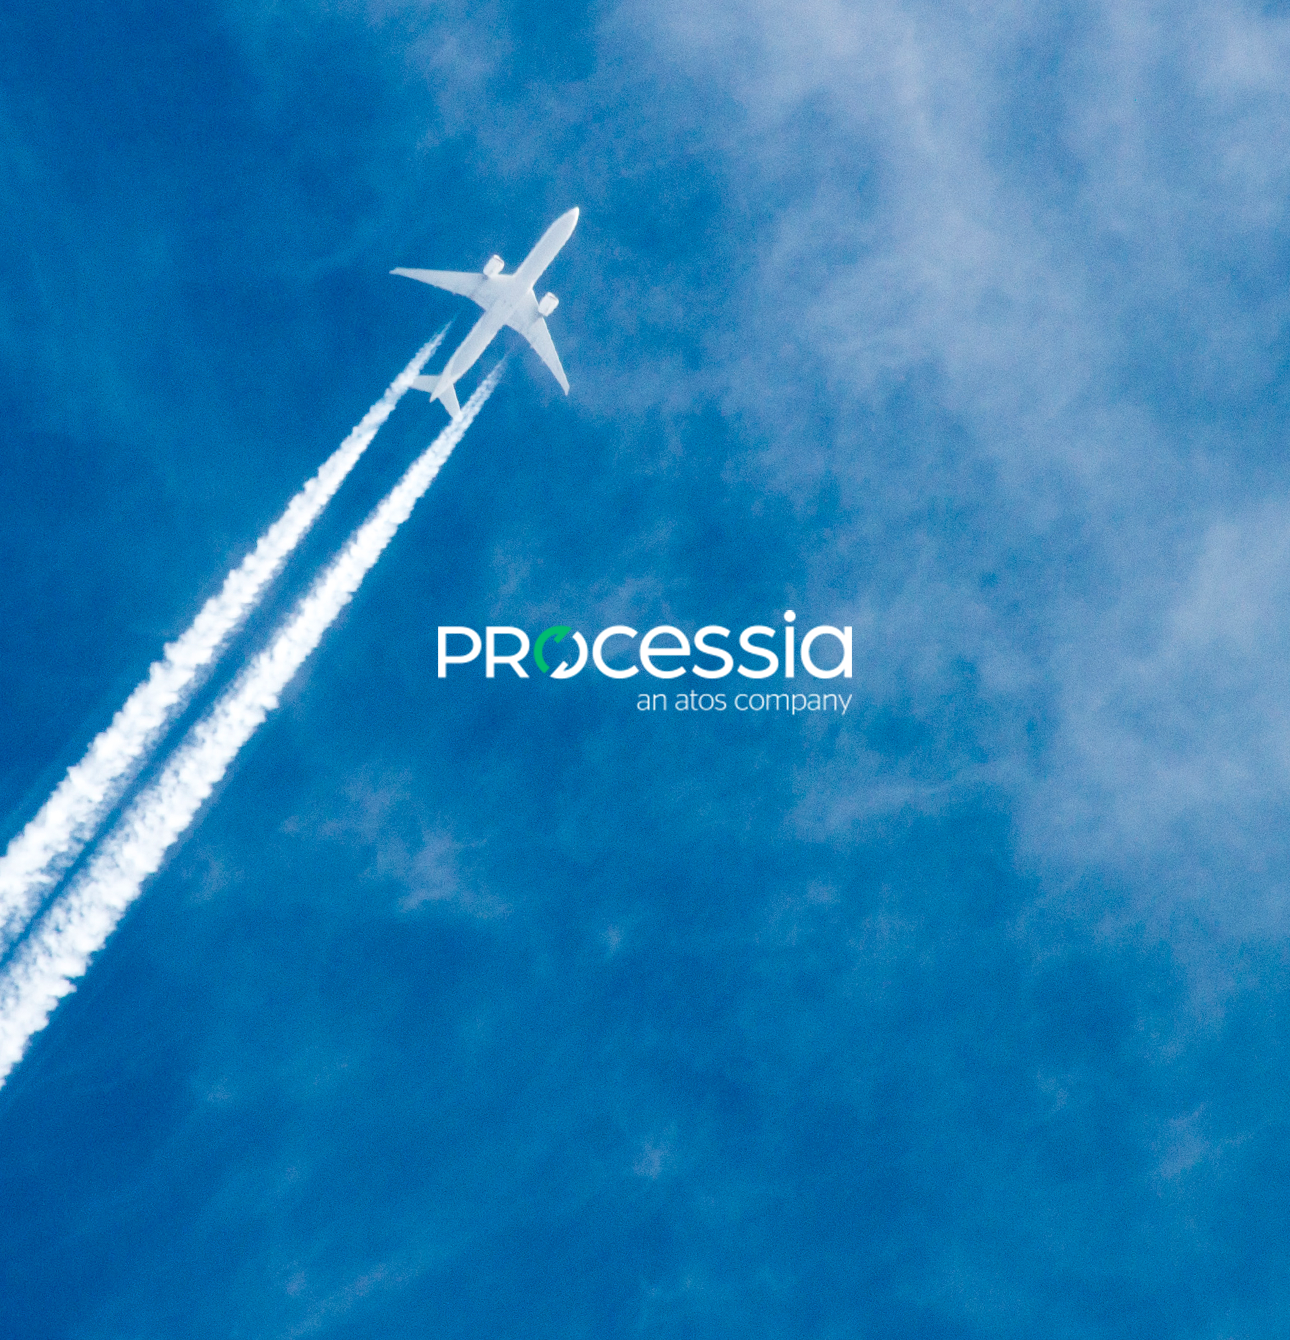 Processia_List_image